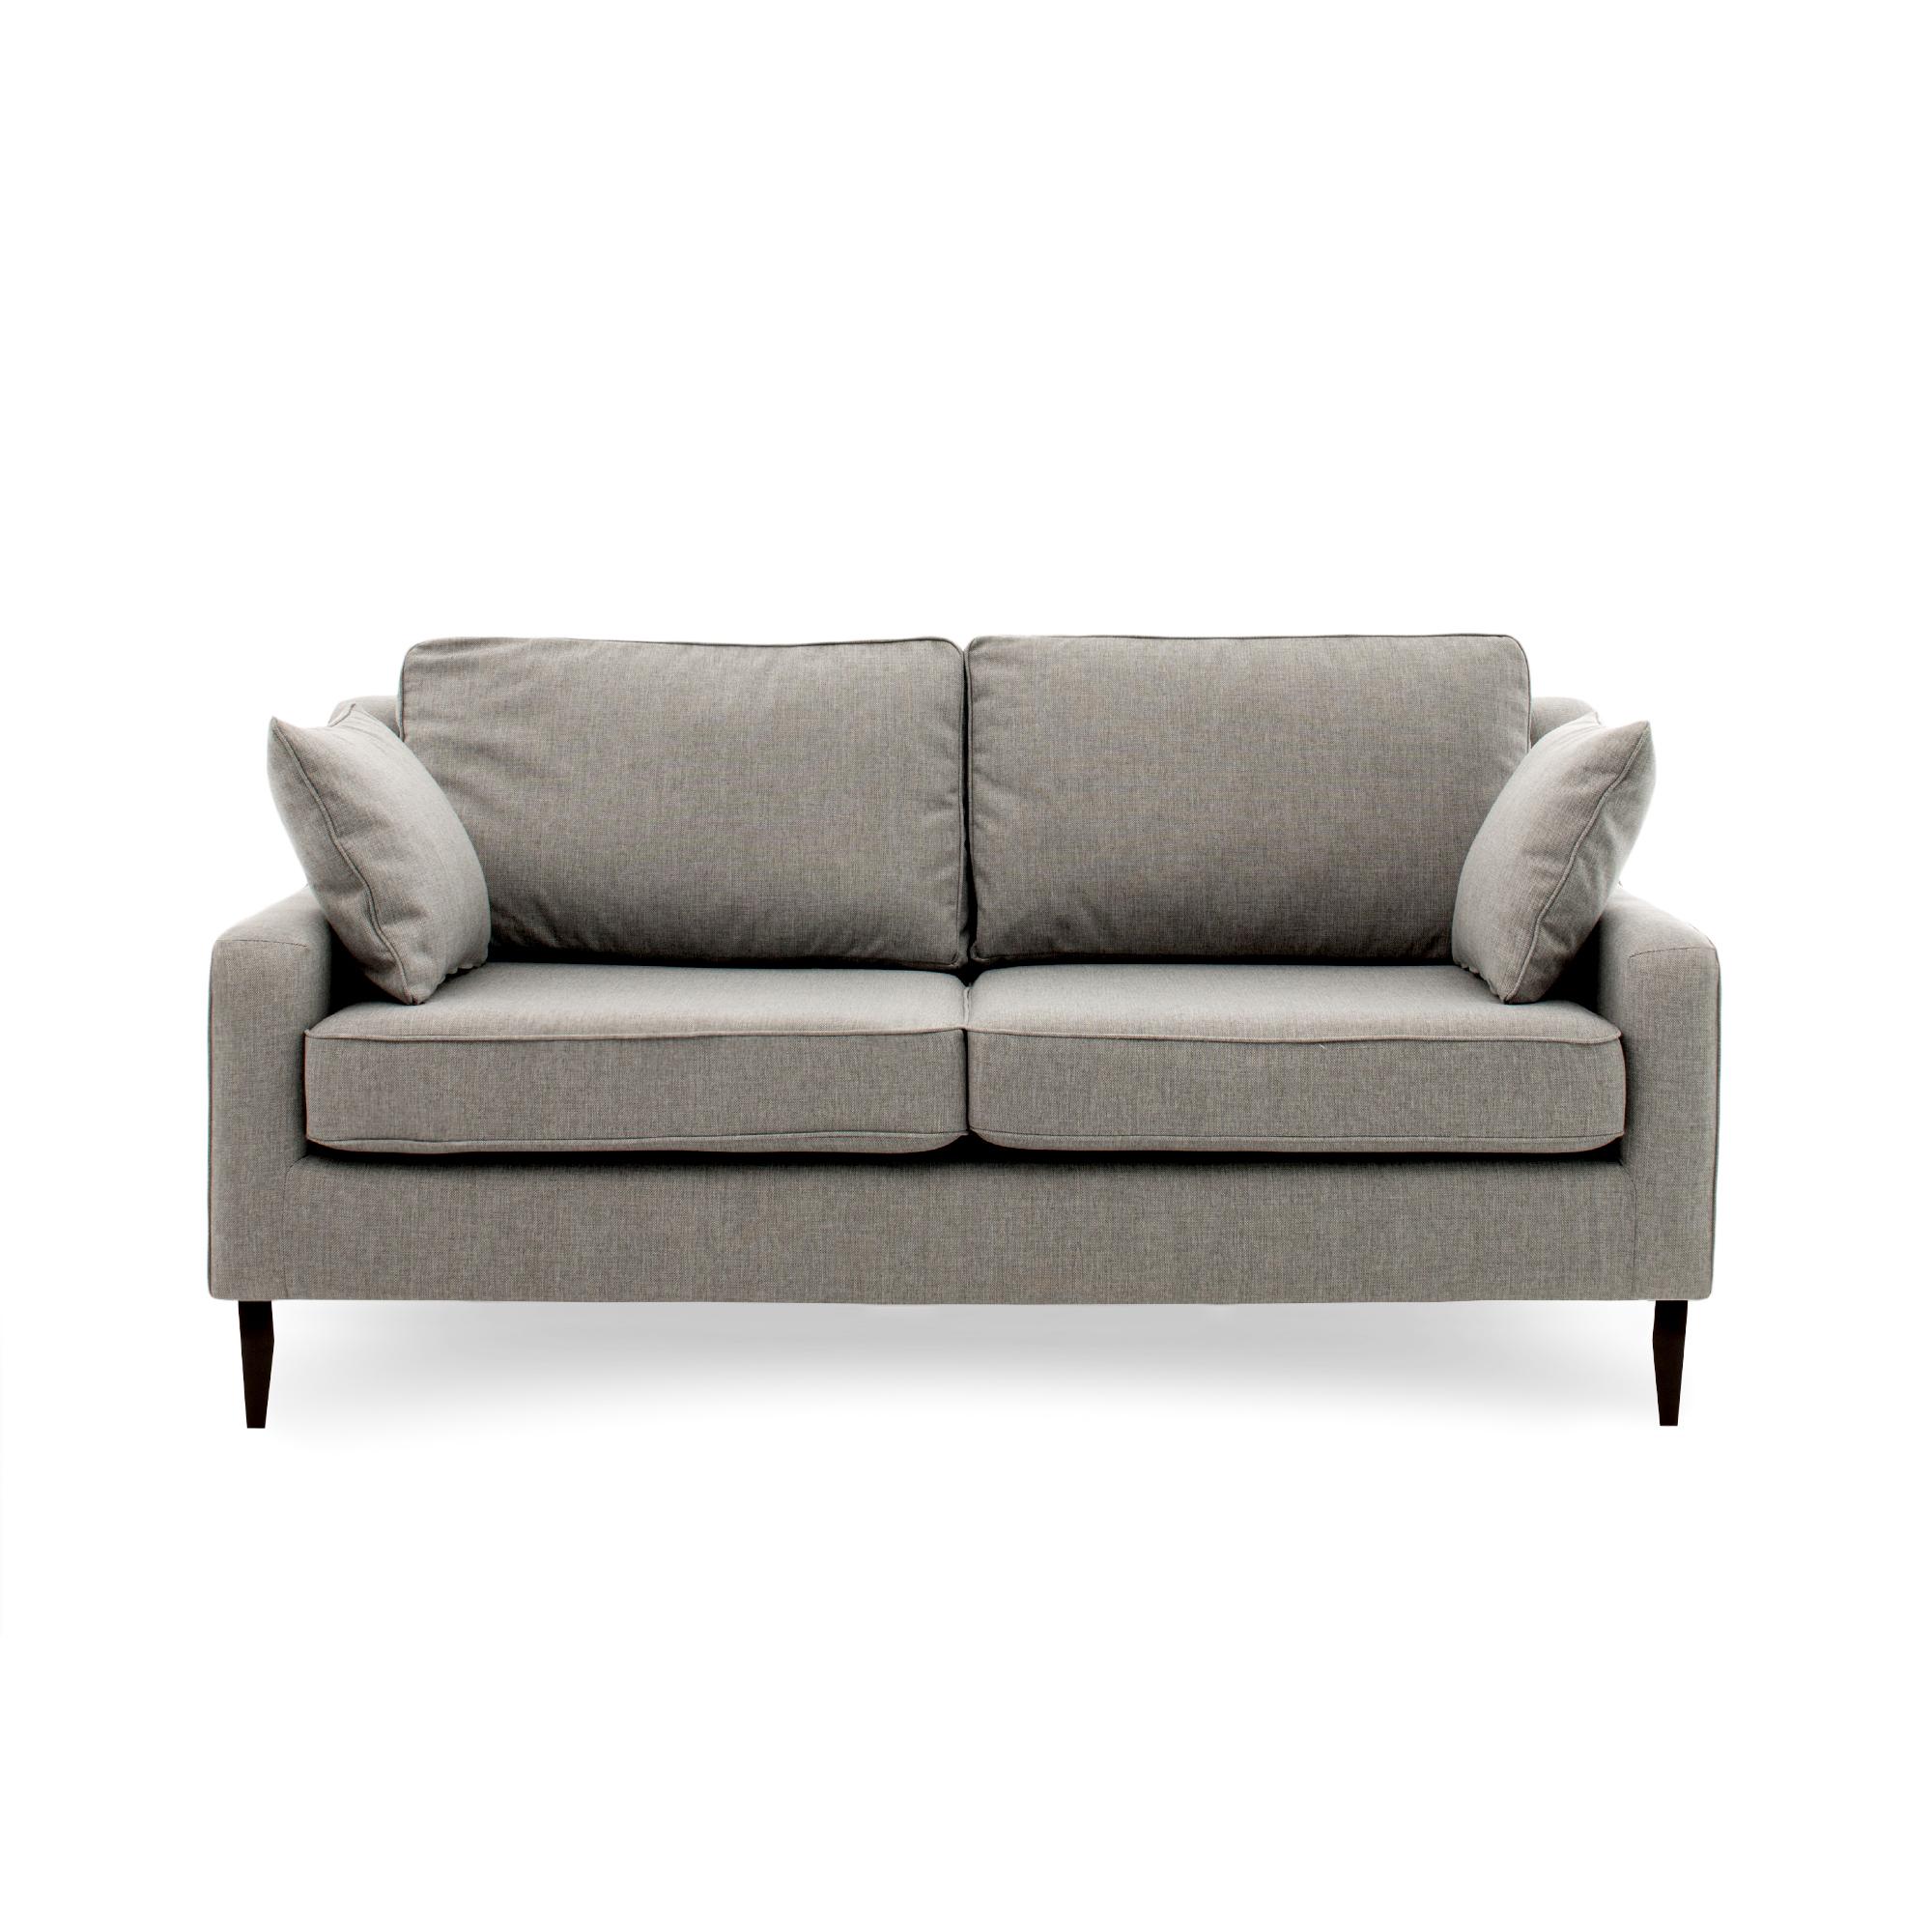 Canapea Fixa 3 locuri Bond Grey